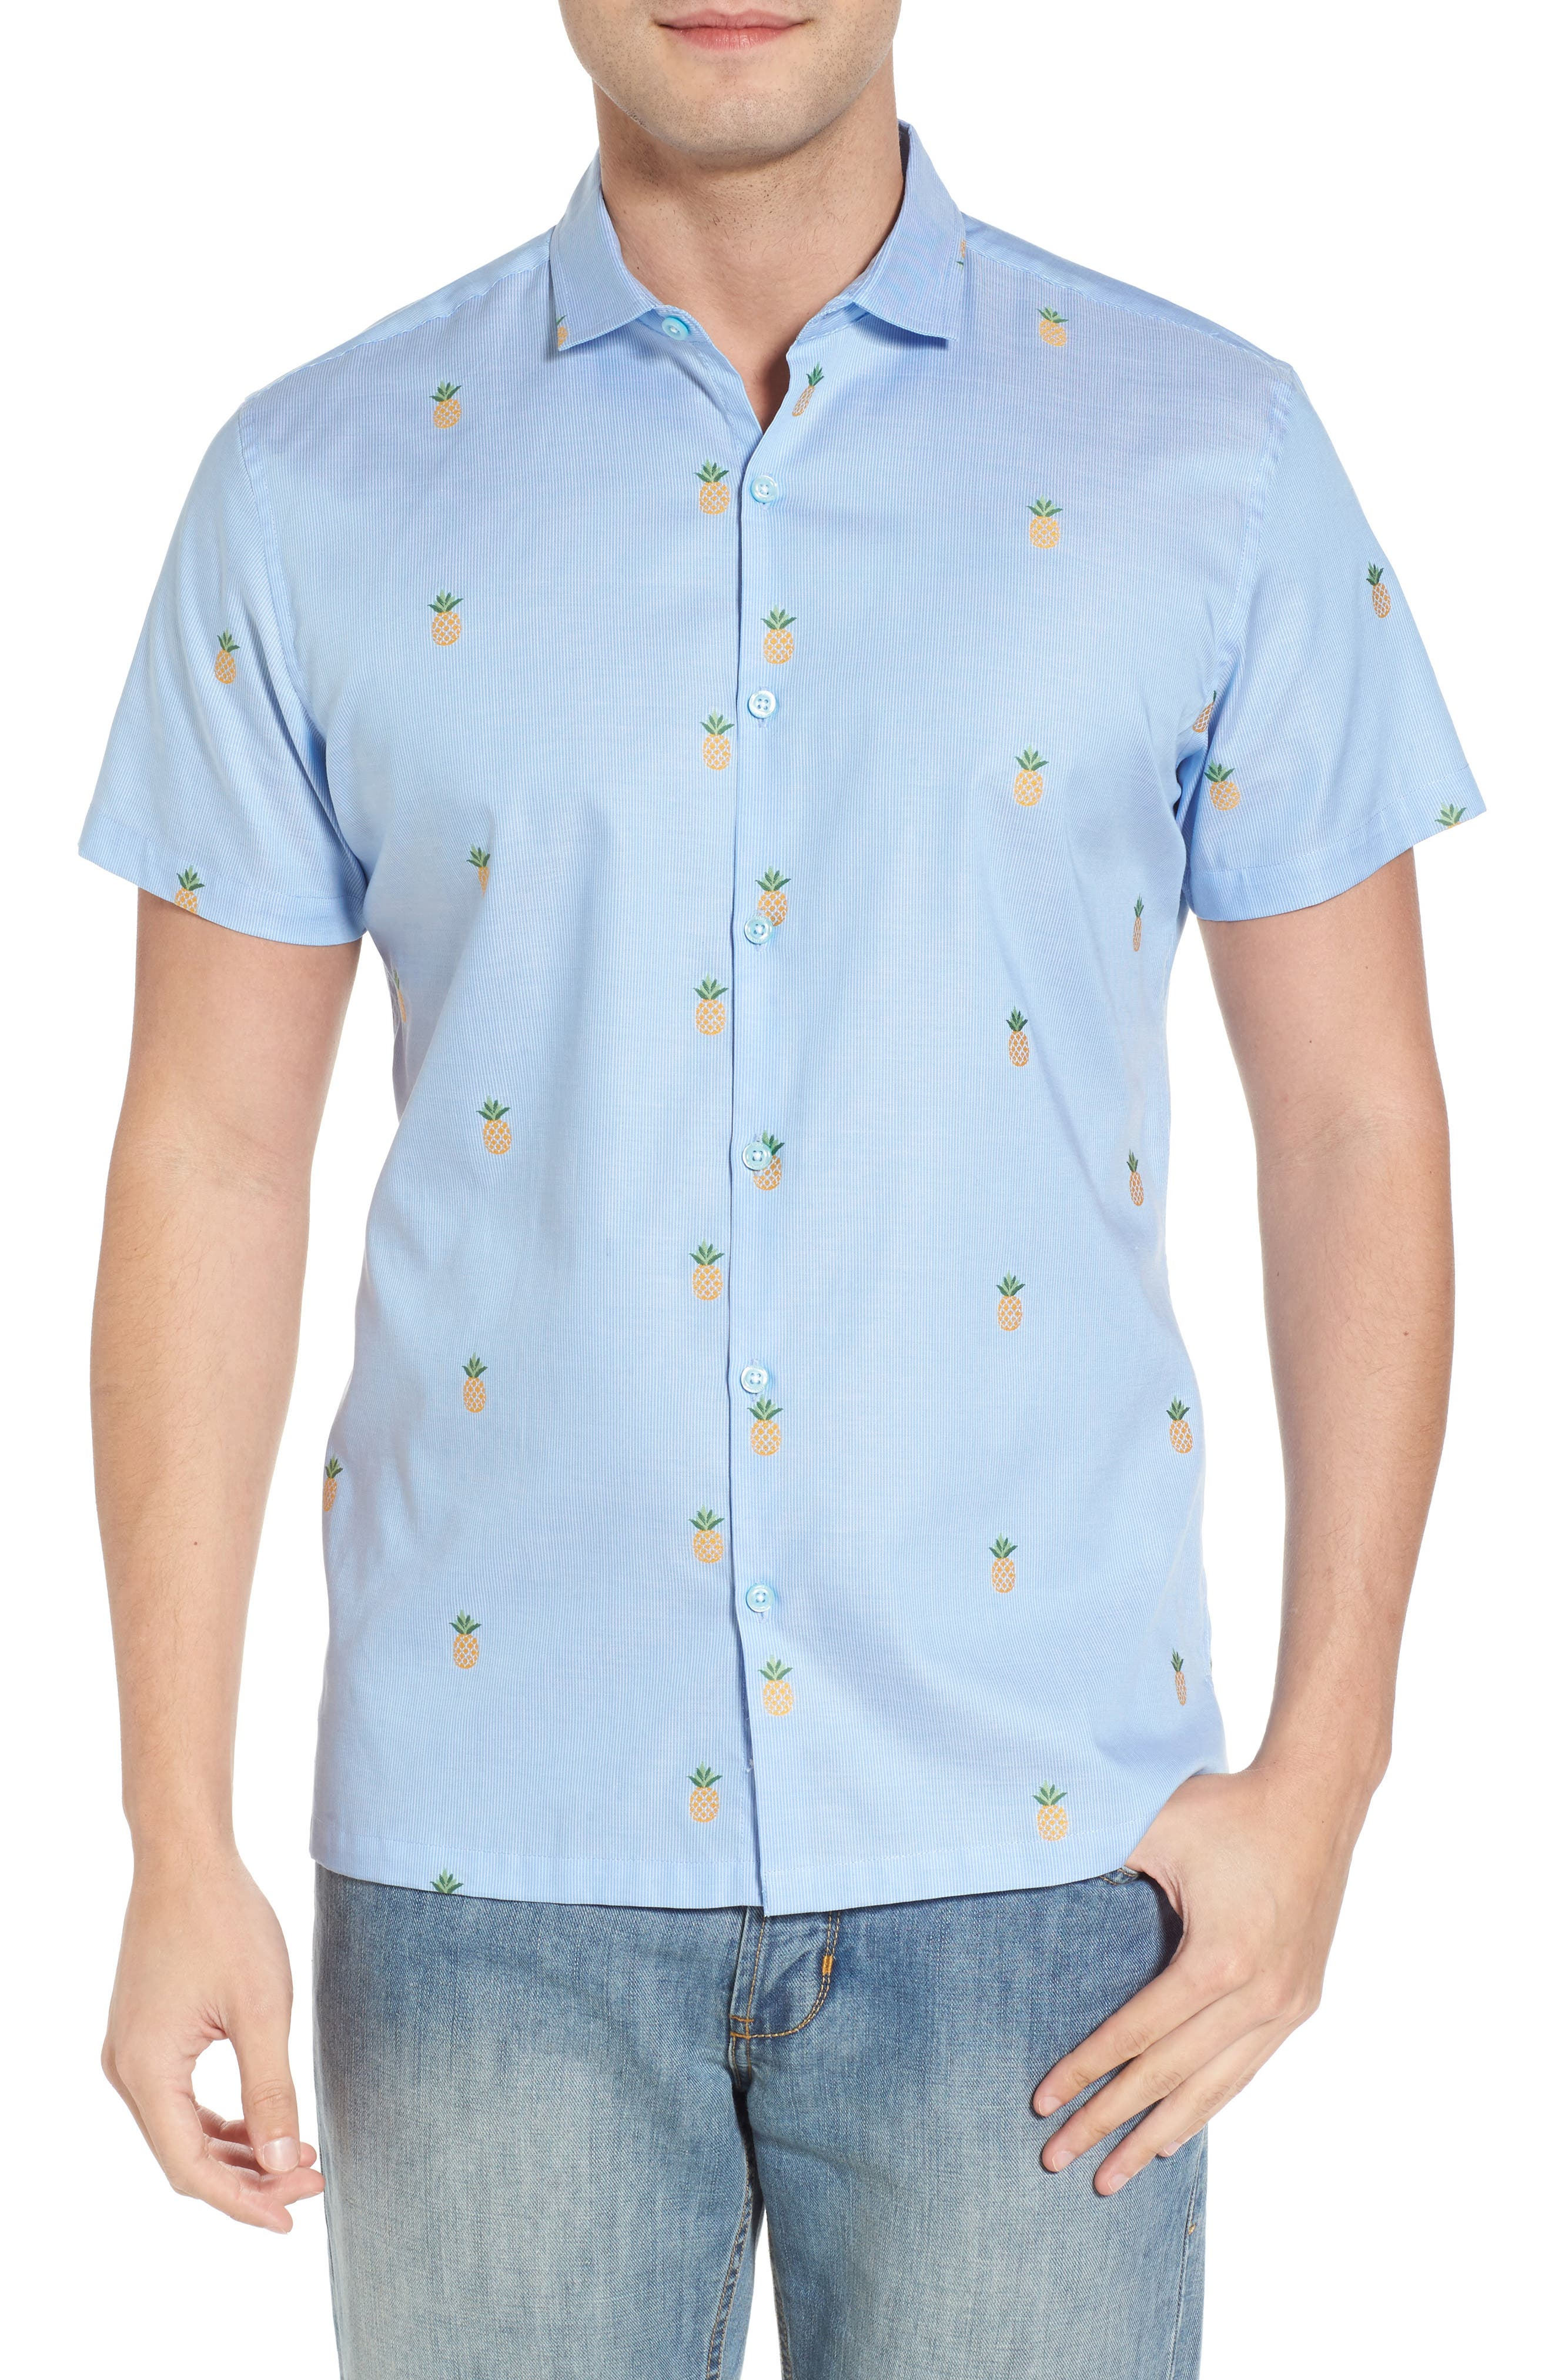 Tori Richard Dole 'N' Row Trim Fit Embroidered Sport Shirt